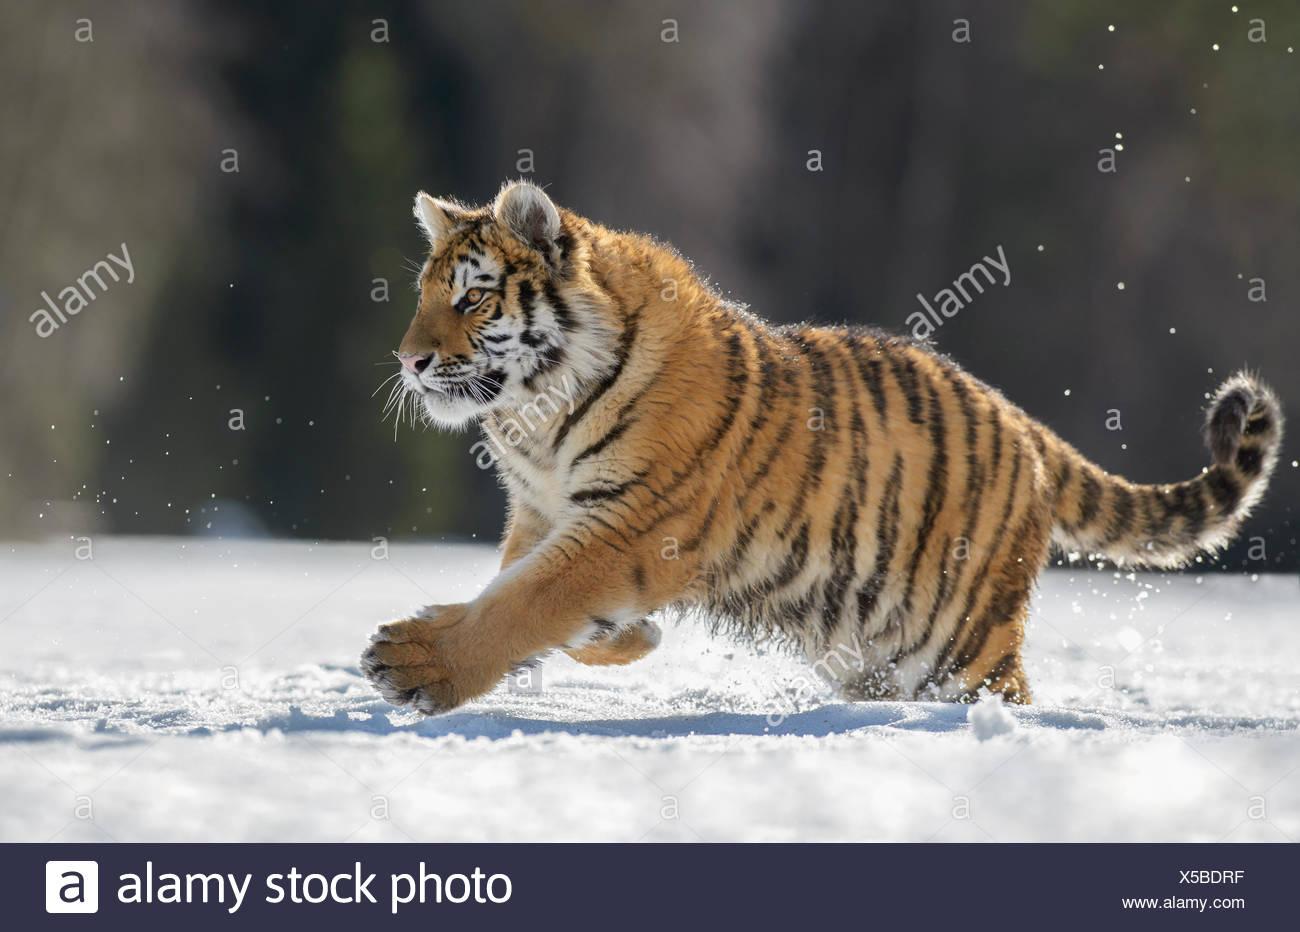 Siberian tiger (Panthera tigris altaica) juvenile running in snow, captive, Moravia, Czech Republic Stock Photo